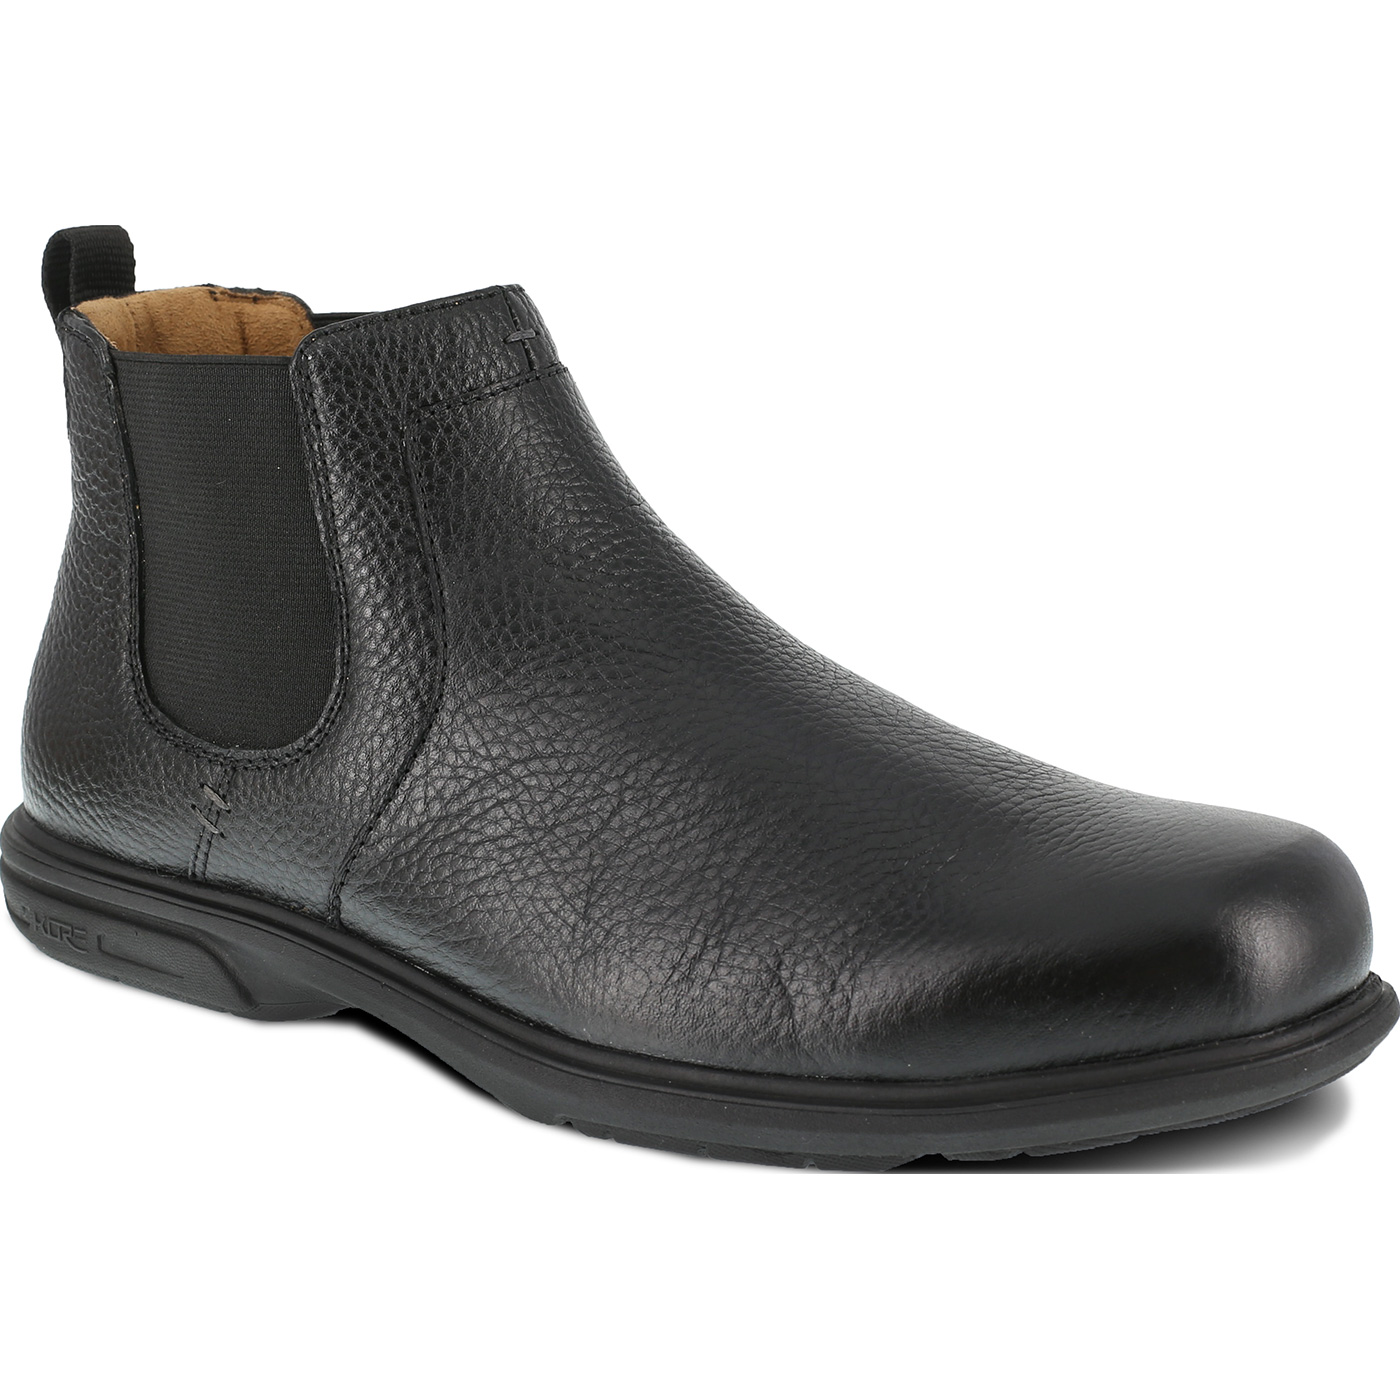 5bdfbcfbdf7 Florsheim Work Loedin Men's Steel Toe Static-Dissipative Black Romeo Work  Boot